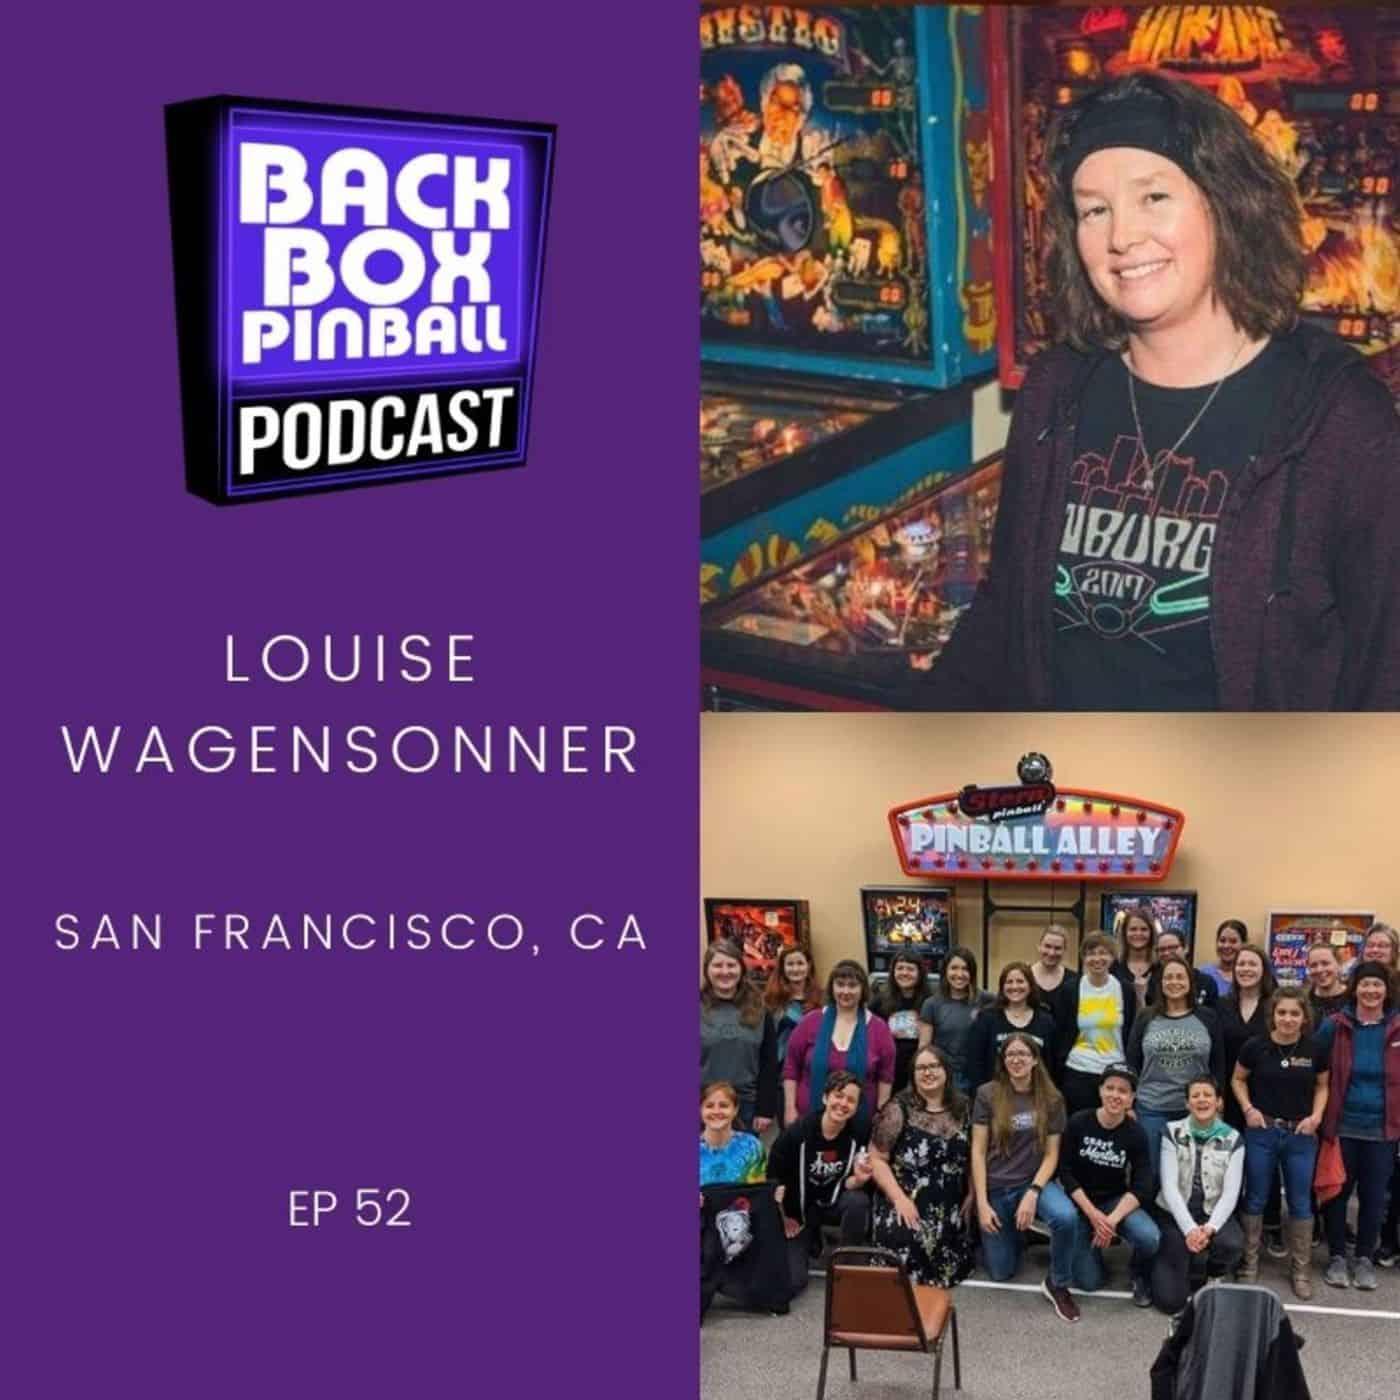 Backbox Pinball Podcast: Louise Wagensonner